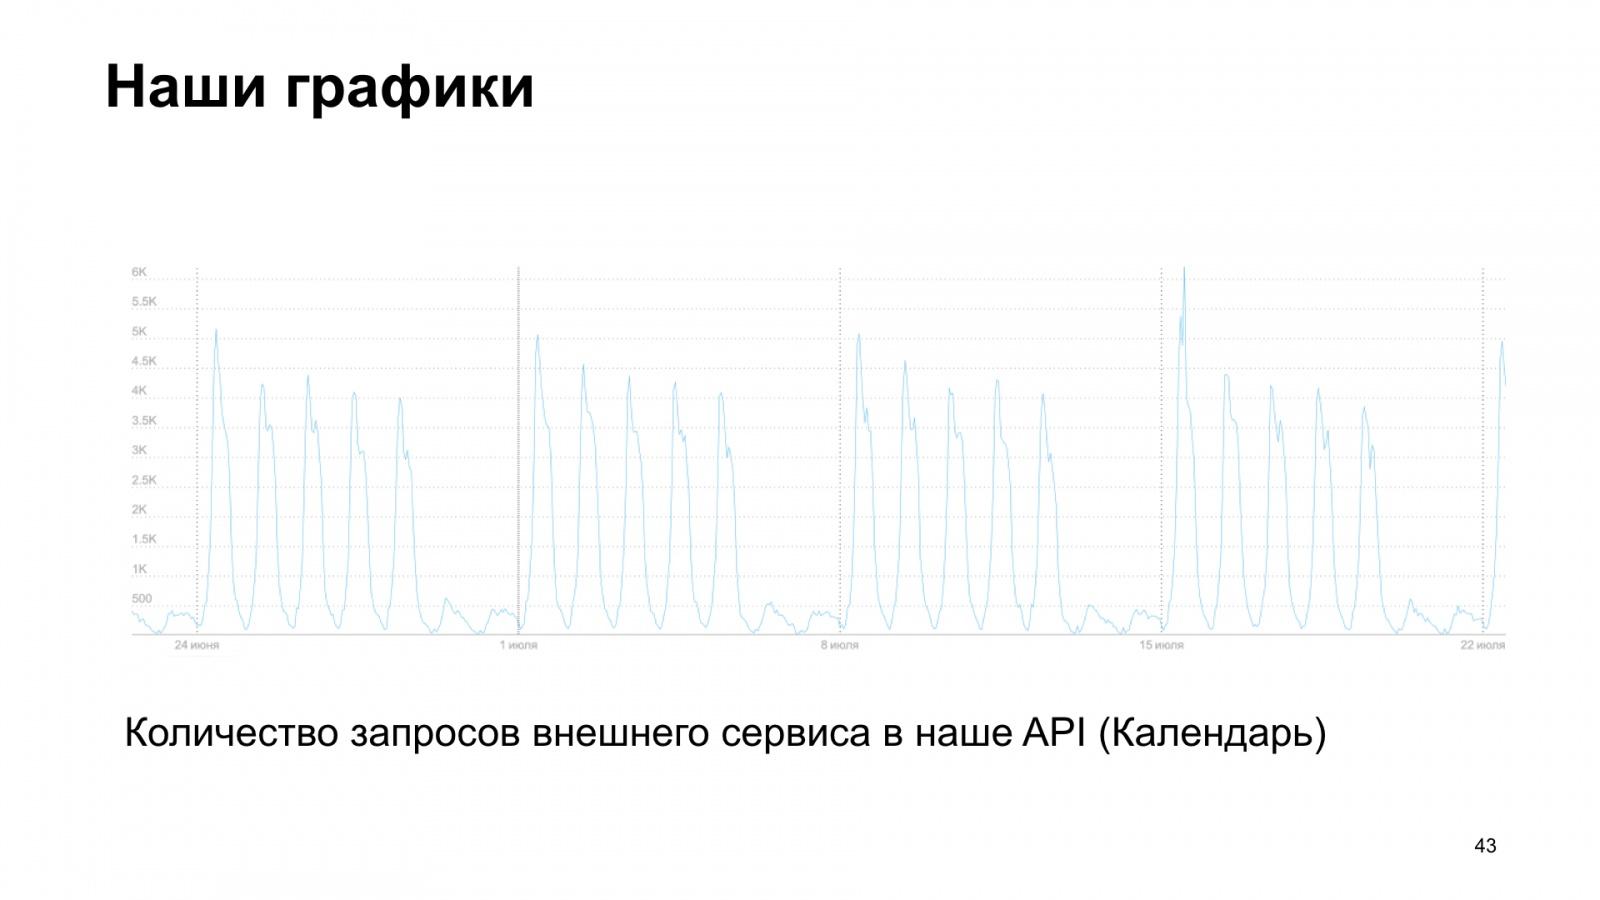 uWSGI в помощь метрикам. Доклад Яндекса - 34